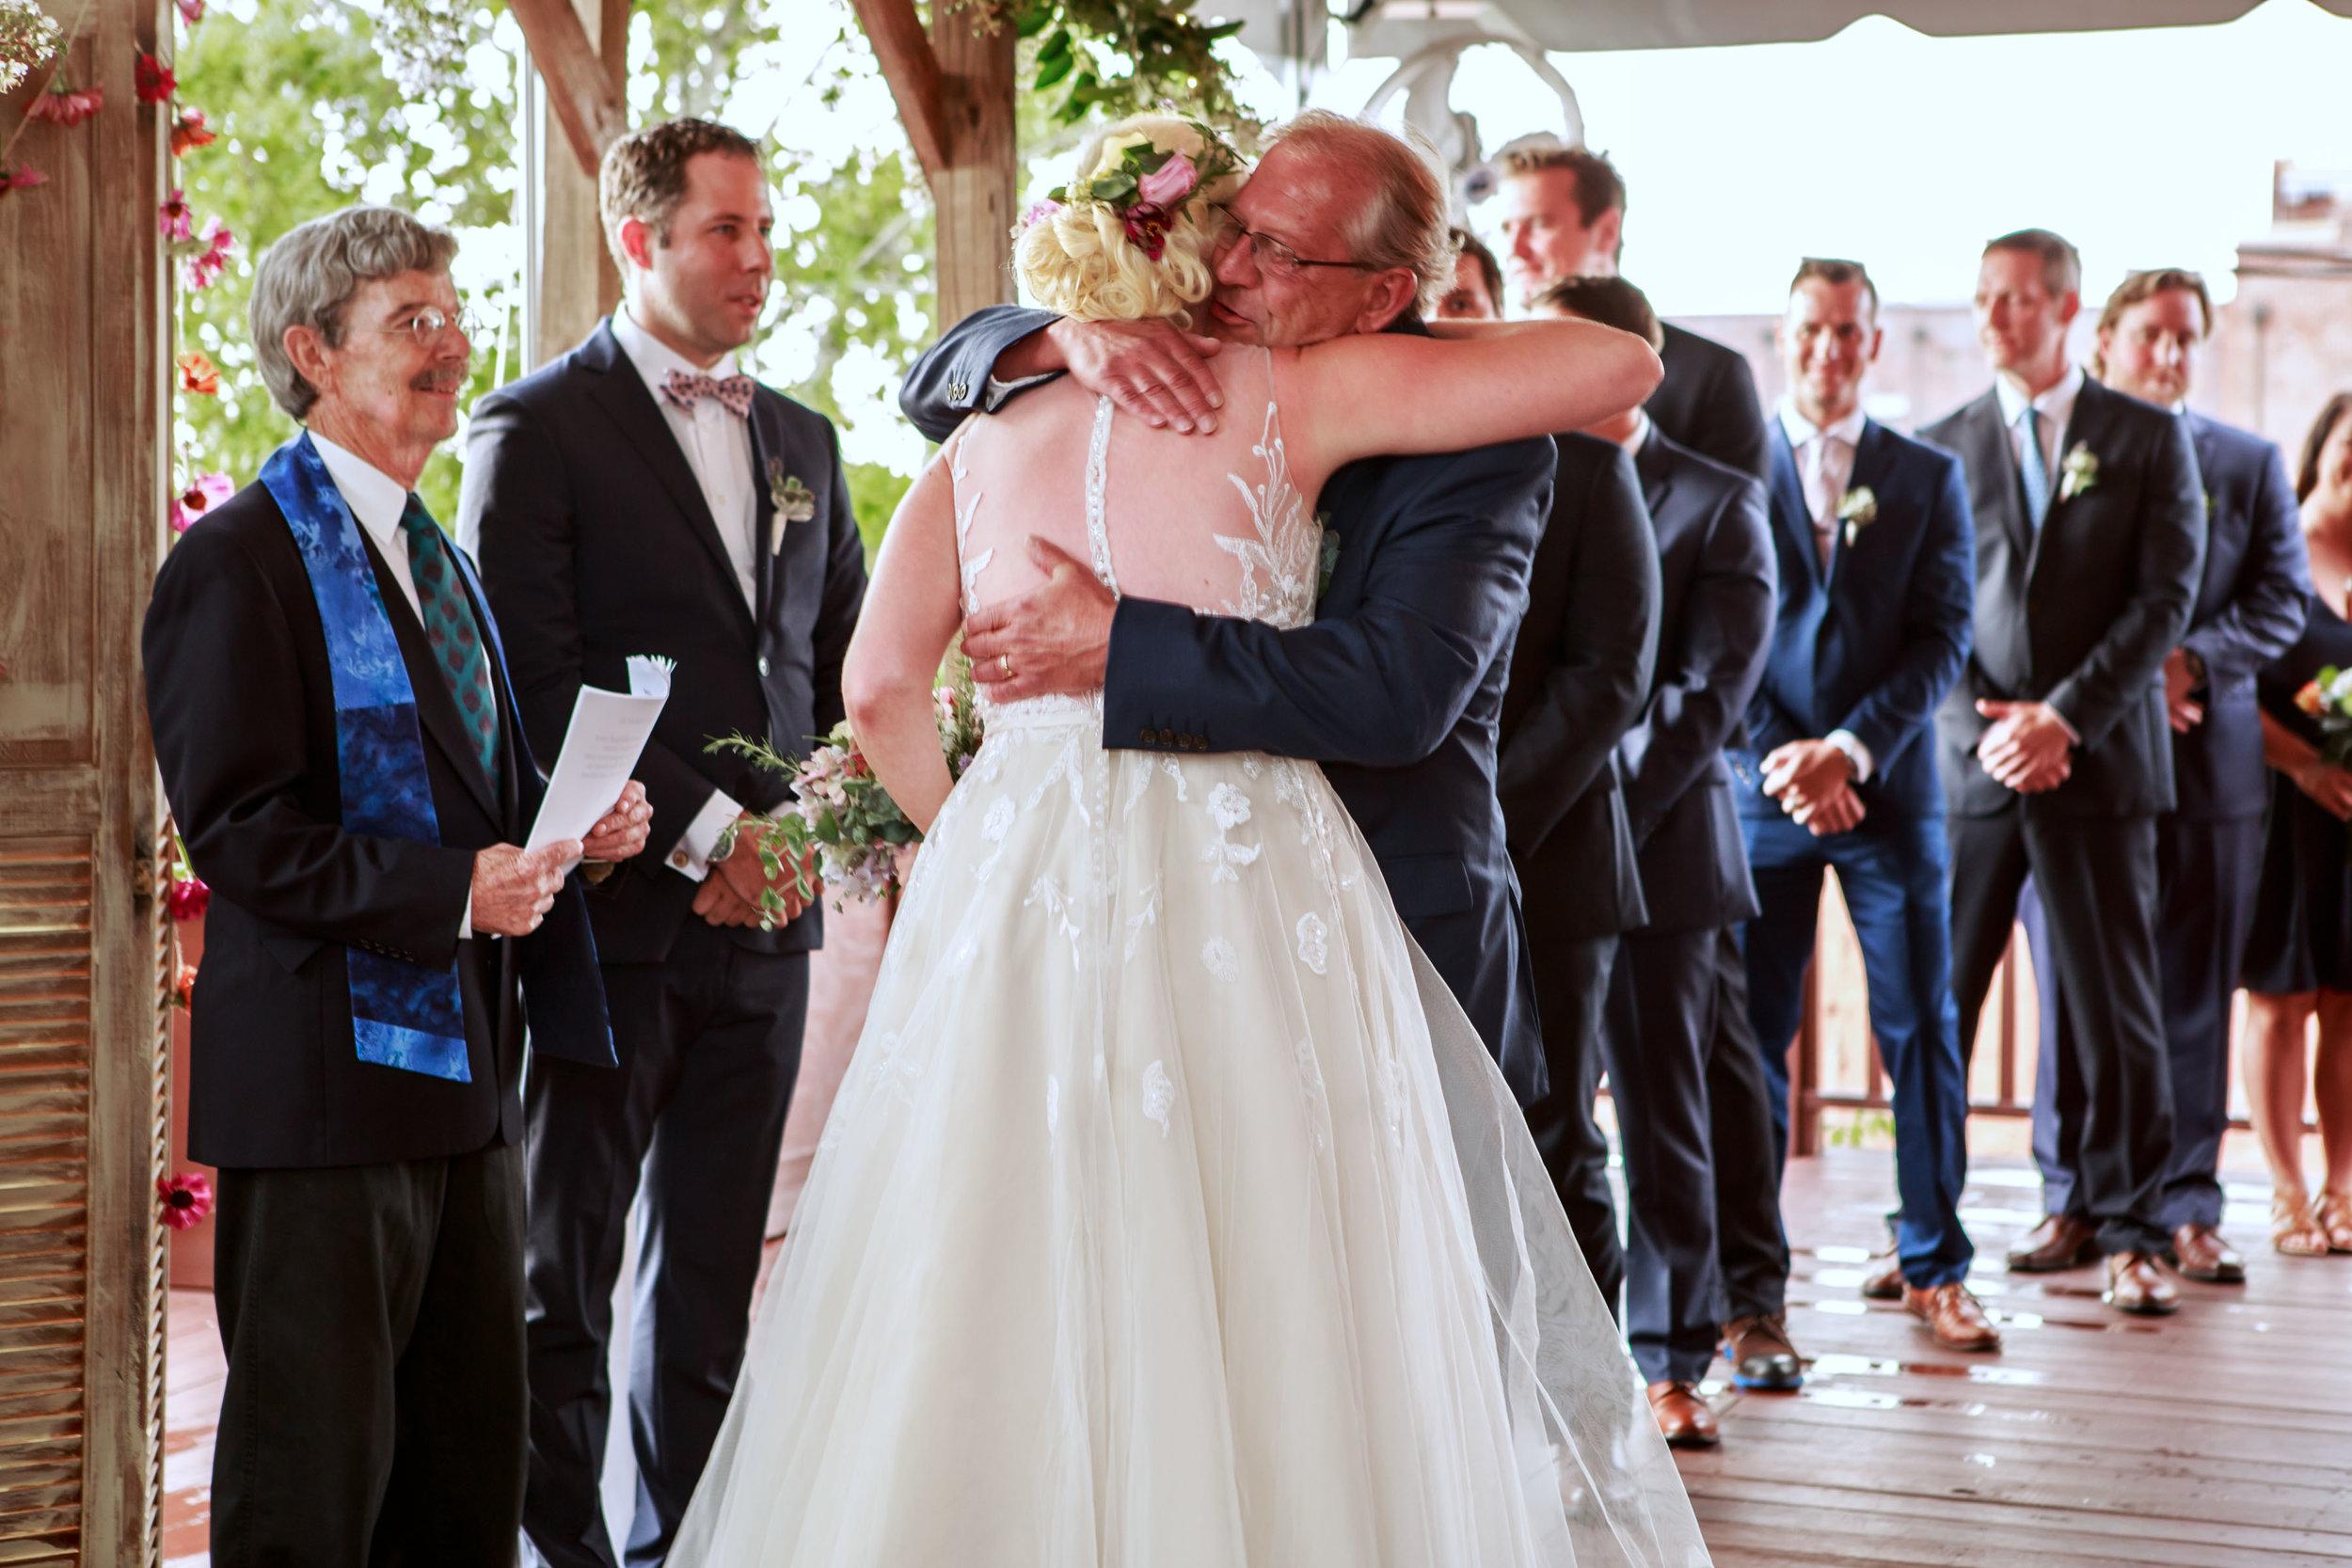 128-South-Wedding-Wilmington-NC-Photographer-Ceremony-013.1.jpg